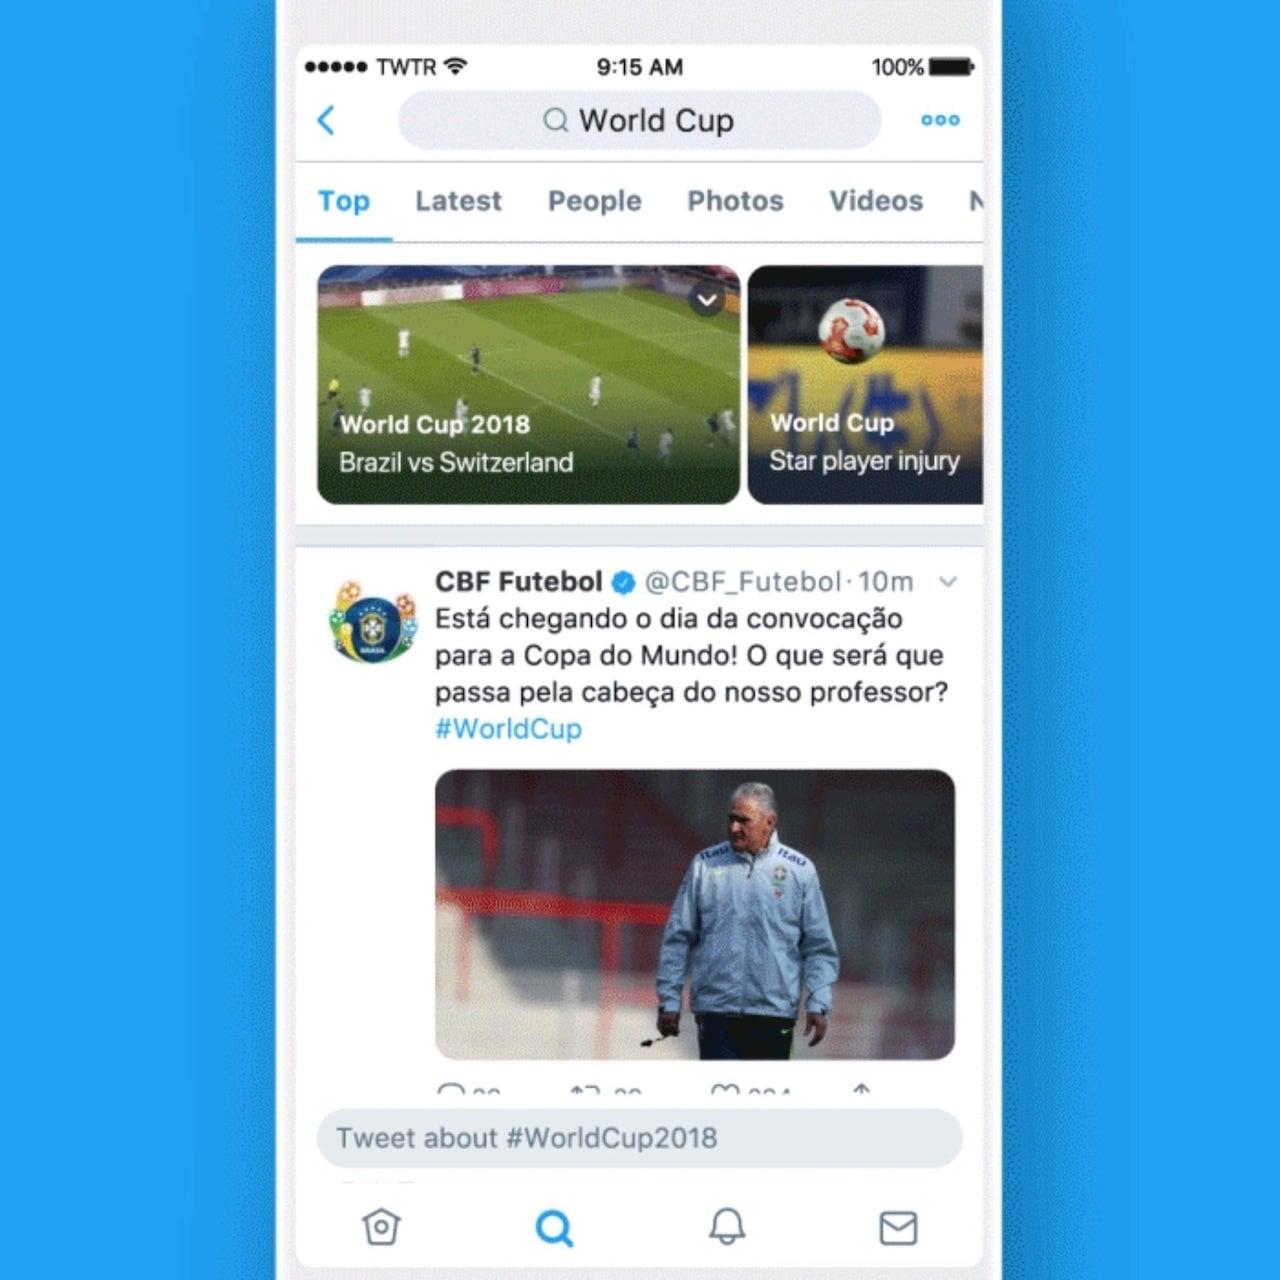 worldcupsearch.jpg.img.fullhd.medium.jpg